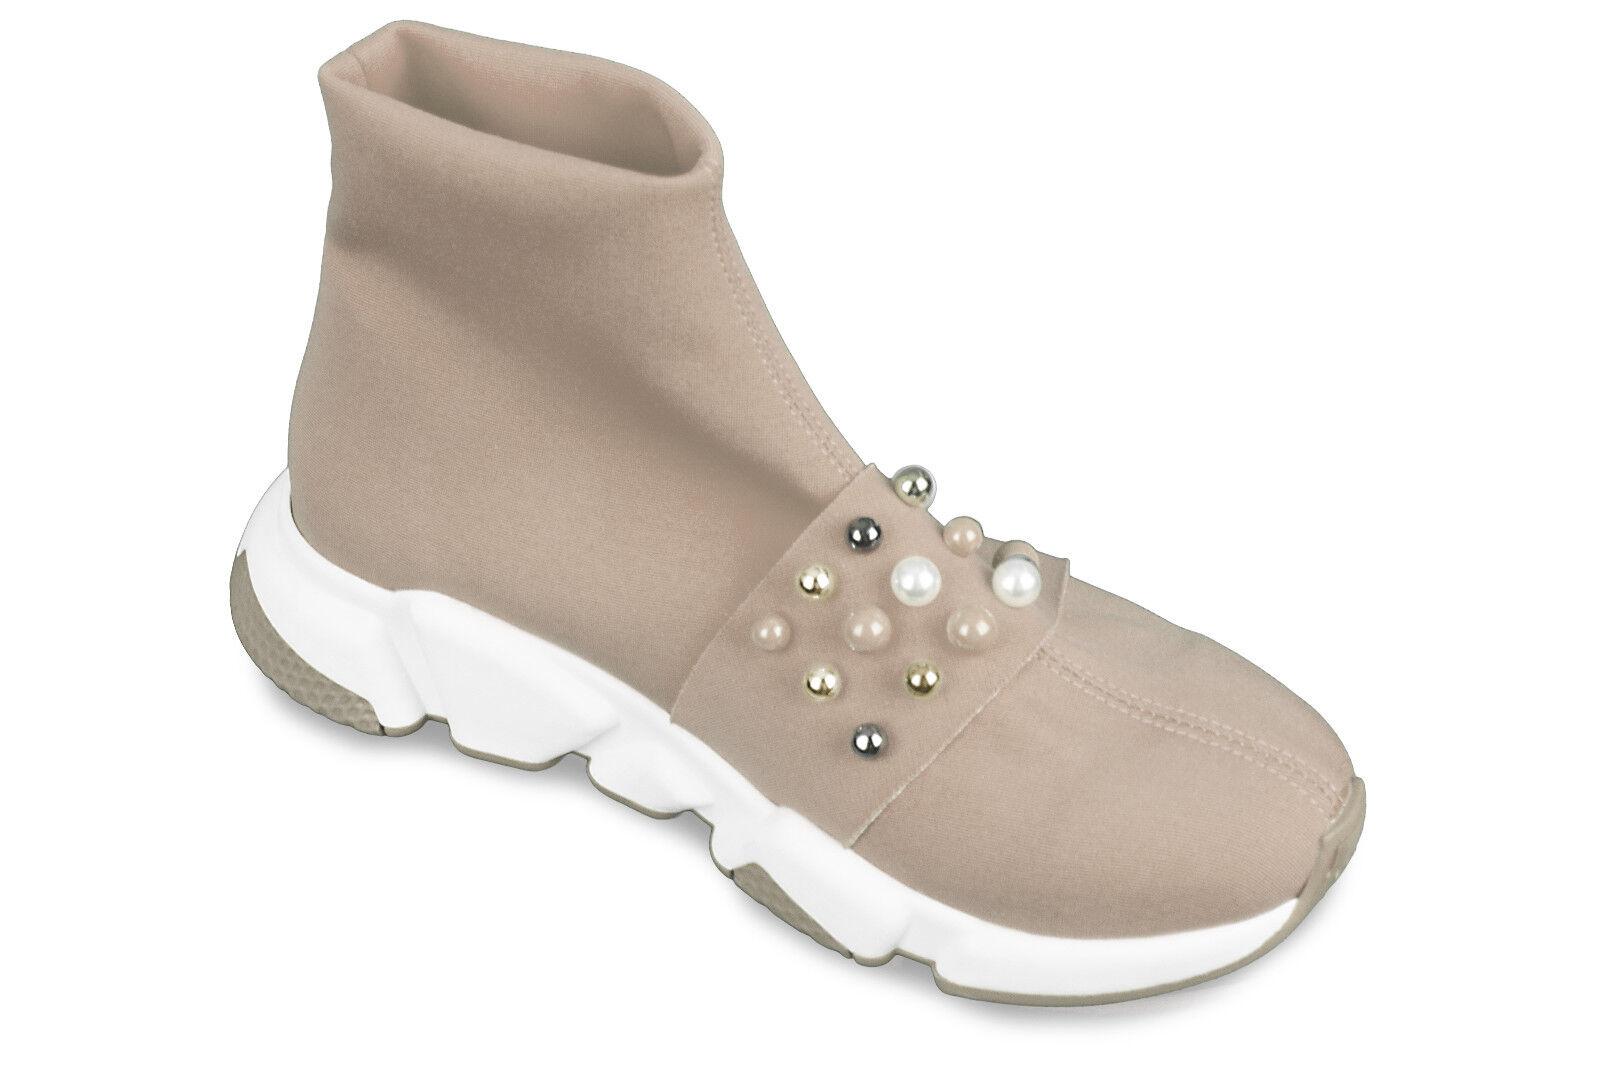 Calze da Donna Scarpe scarpe da ginnastica Scarpe colonia Plateau Plateau Plateau Scarpe beige perle 938304